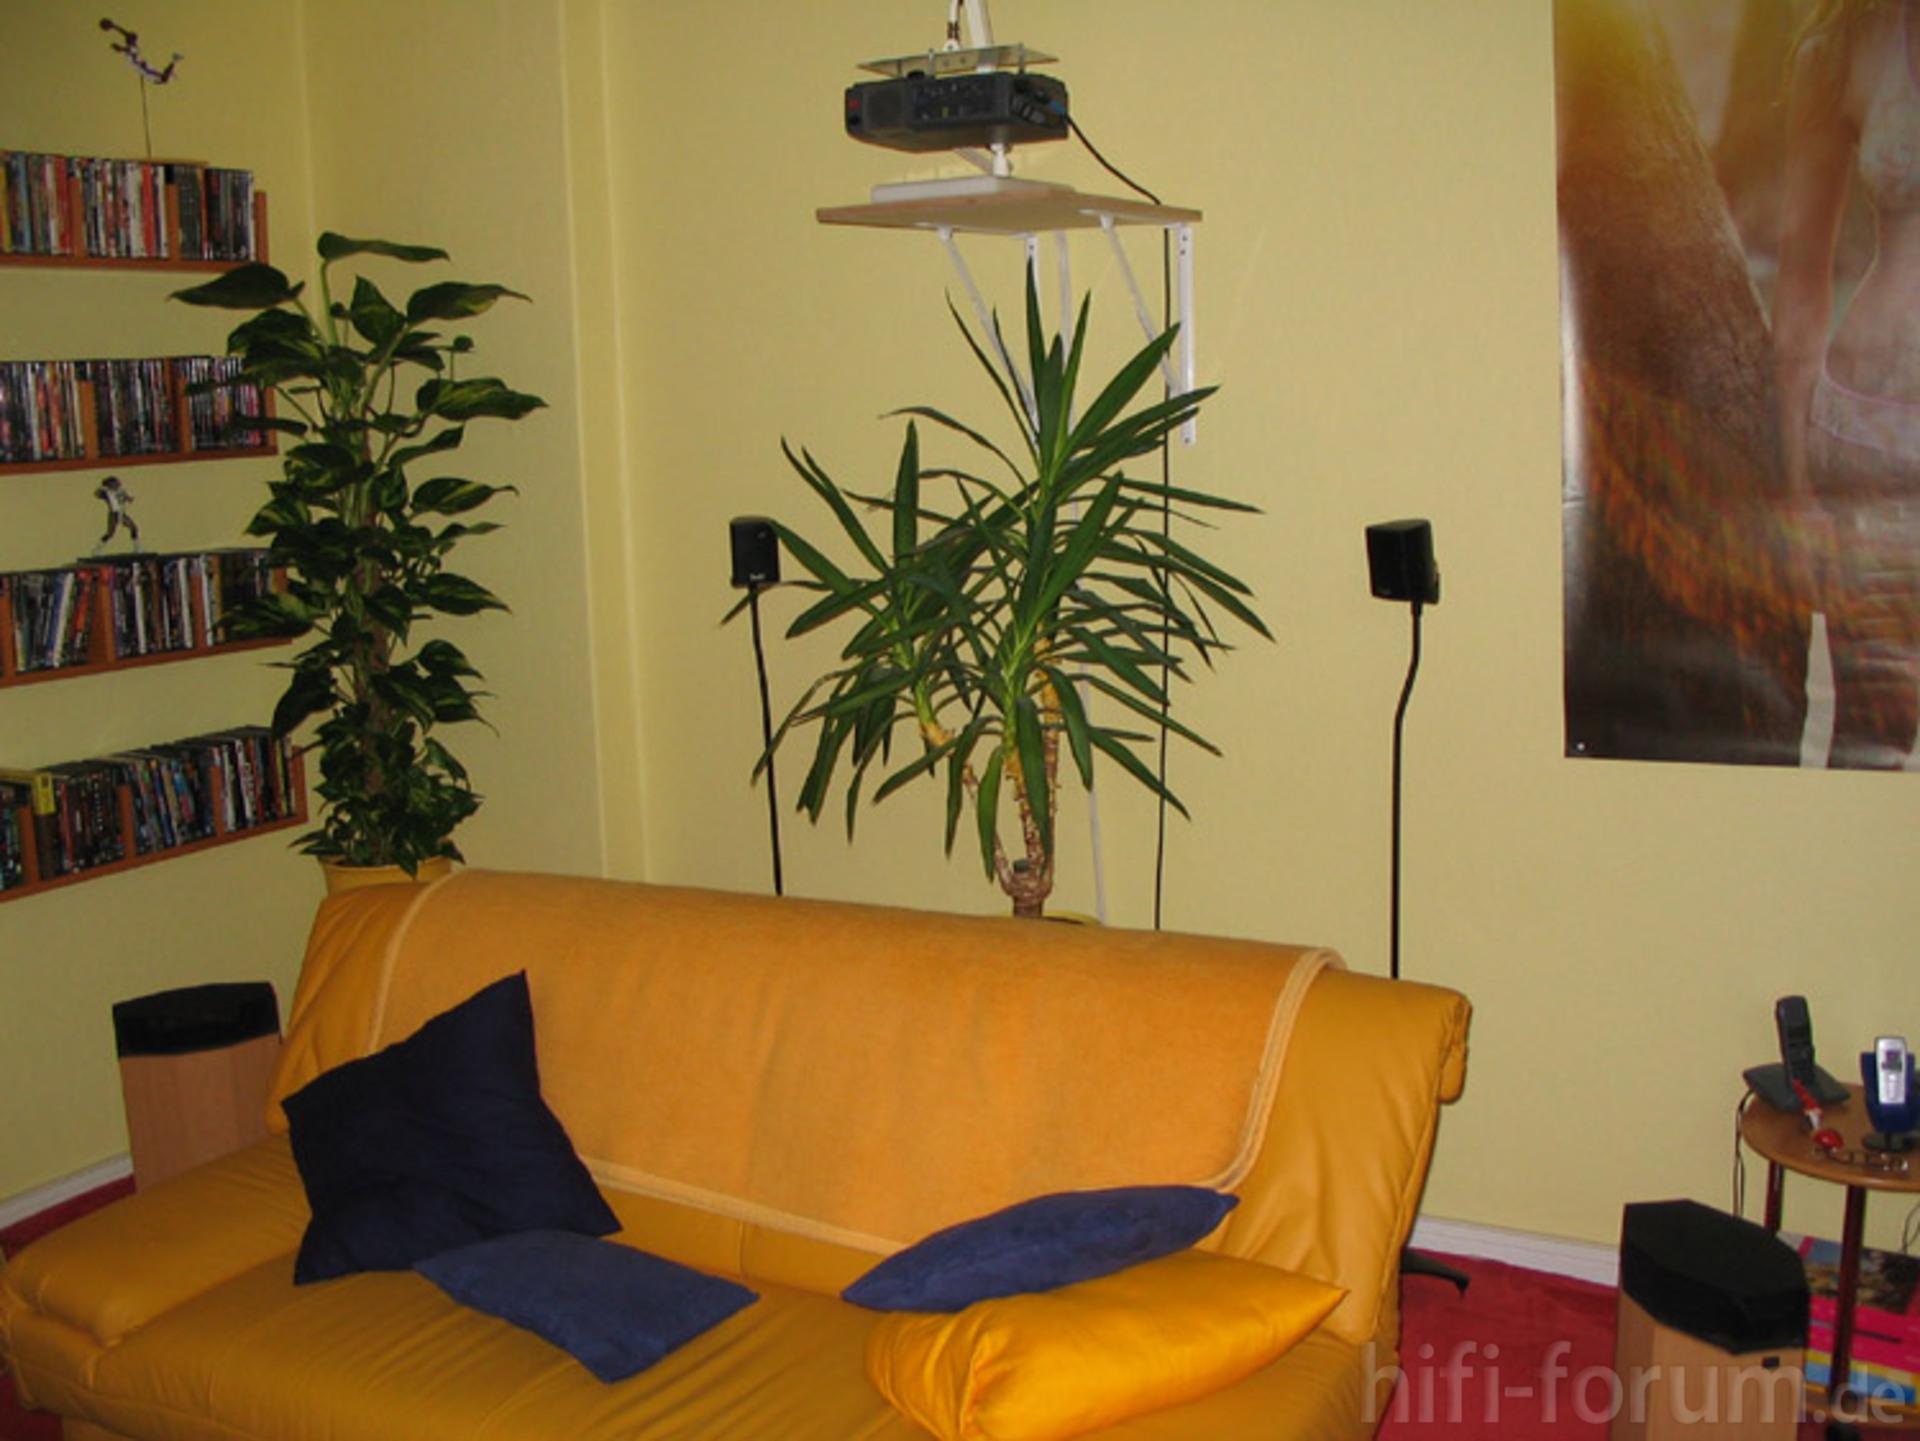 bildwerfer r ckraumklangproduzenten und hifi kino sofa. Black Bedroom Furniture Sets. Home Design Ideas